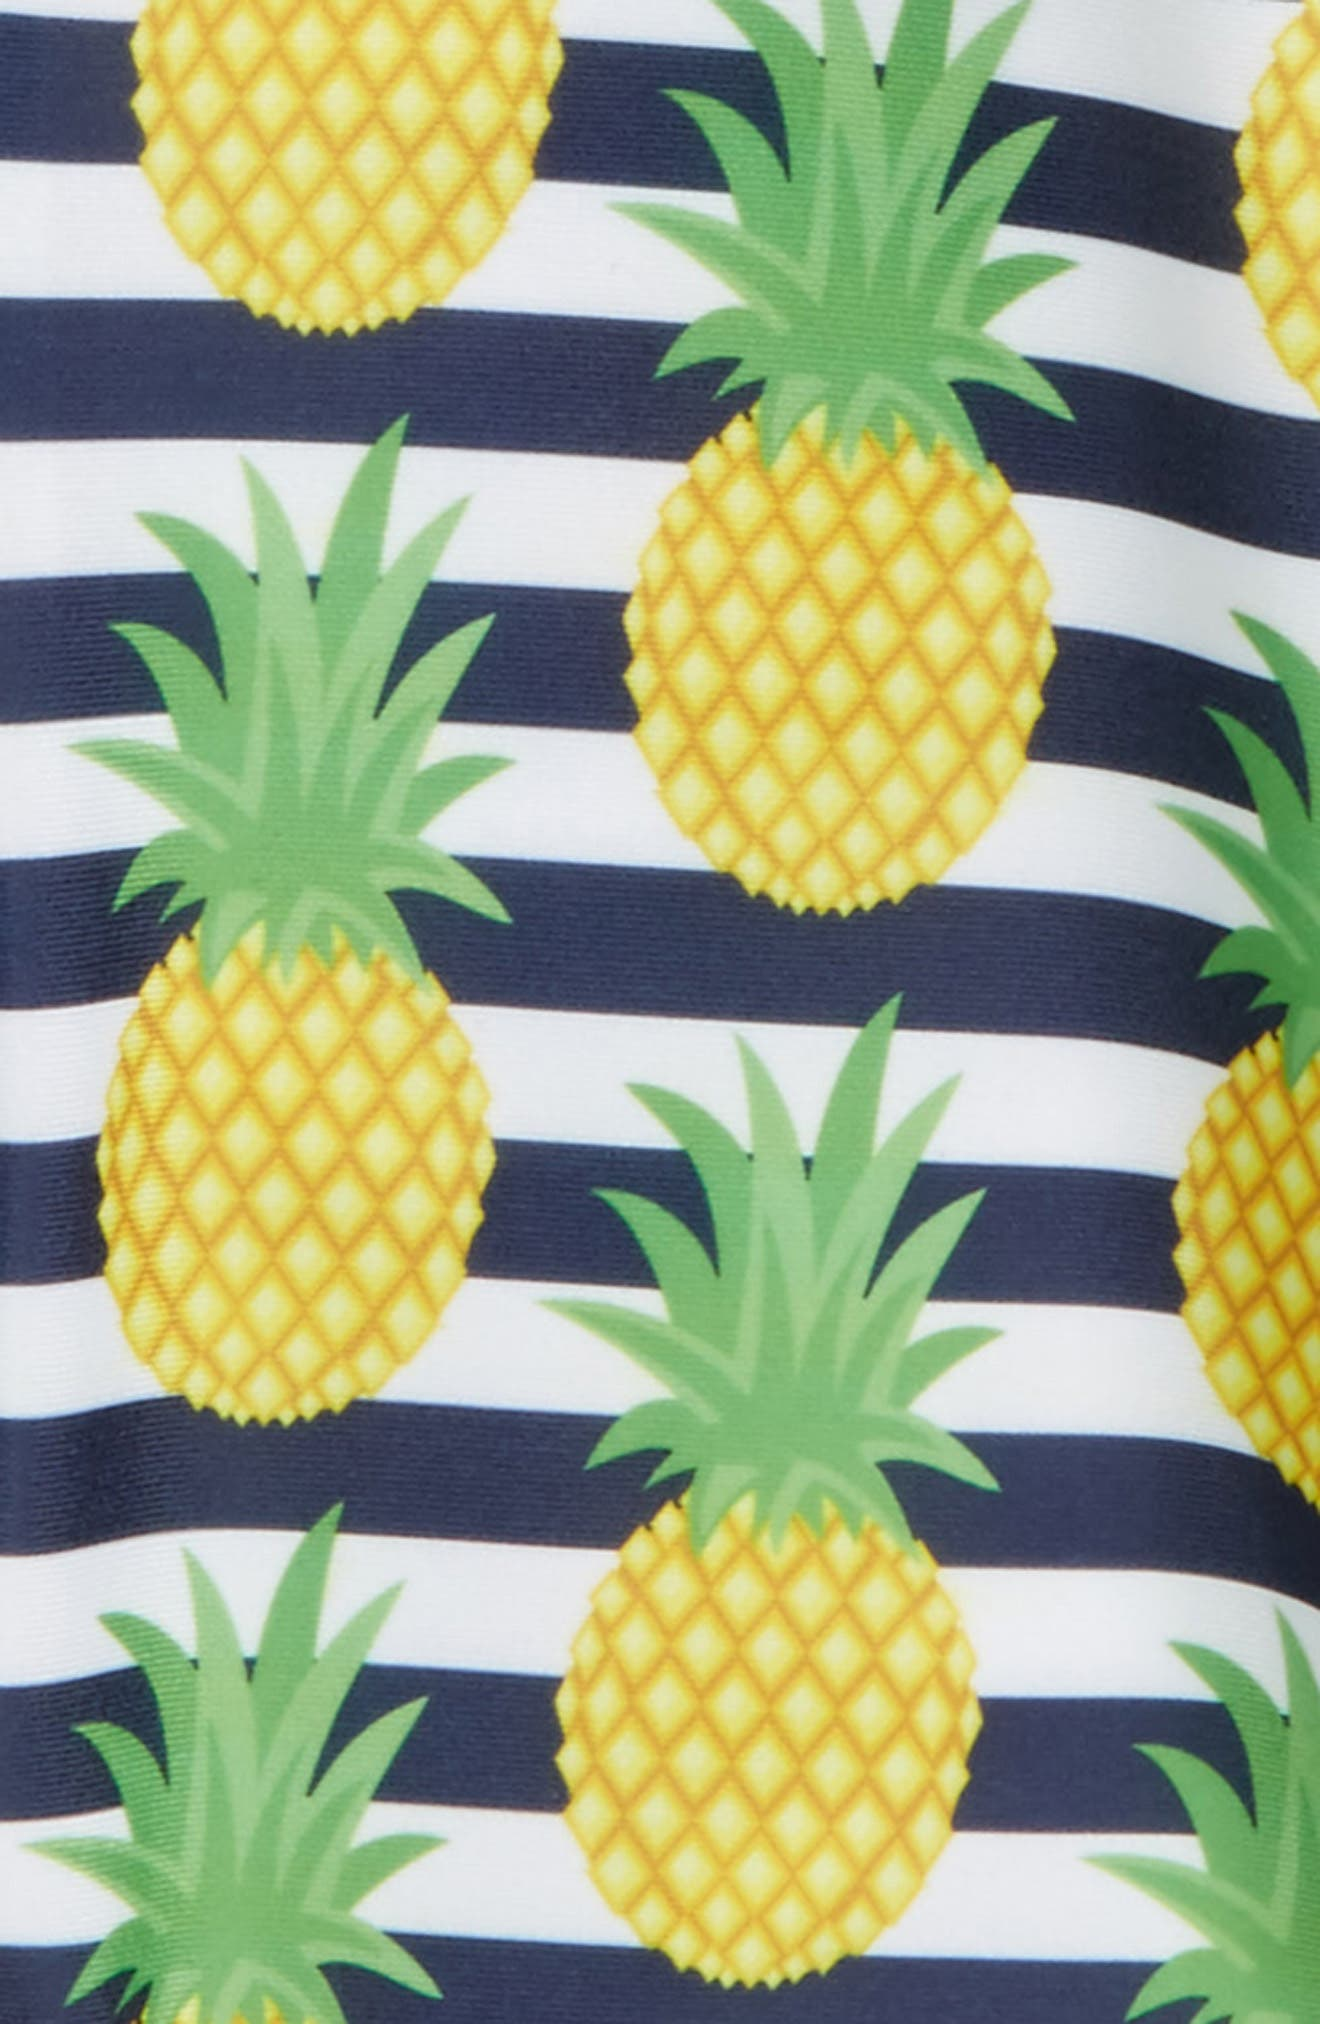 Preppy Pineapples One-Piece Rashguard Swimsuit,                             Alternate thumbnail 2, color,                             Blue Multi